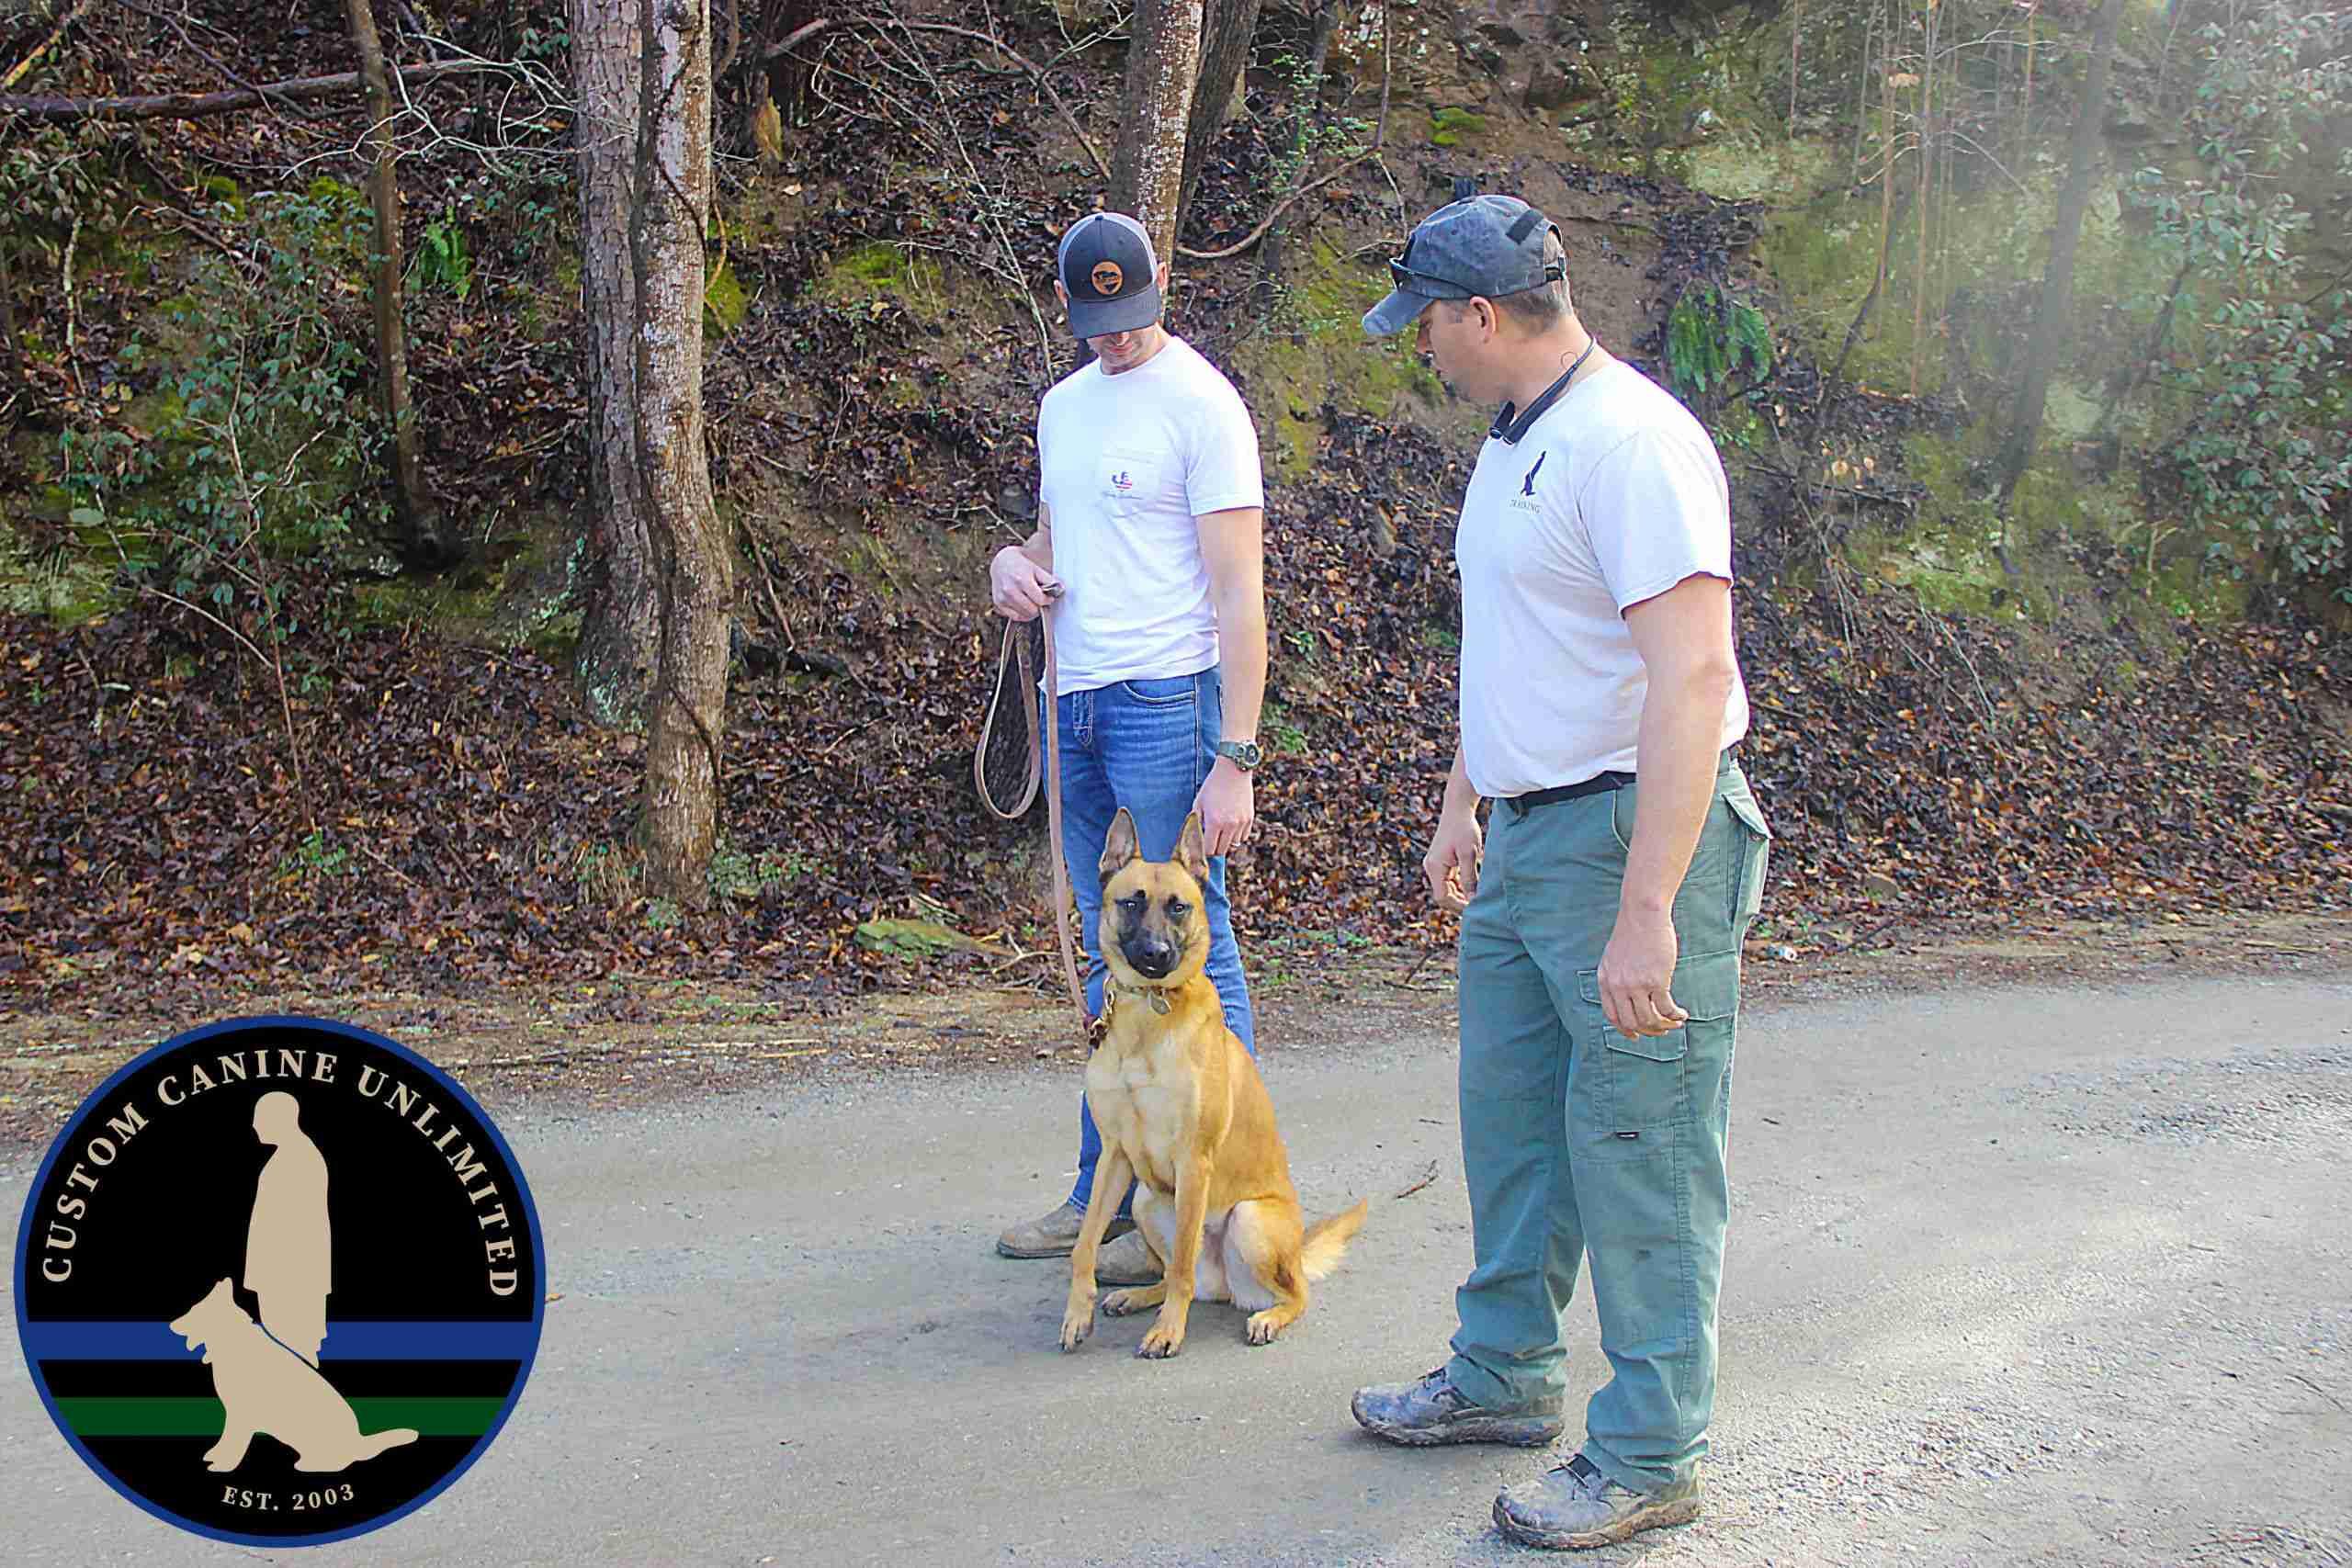 Veteran Scott with K9 Trainer Scott K9 Training a Malinois